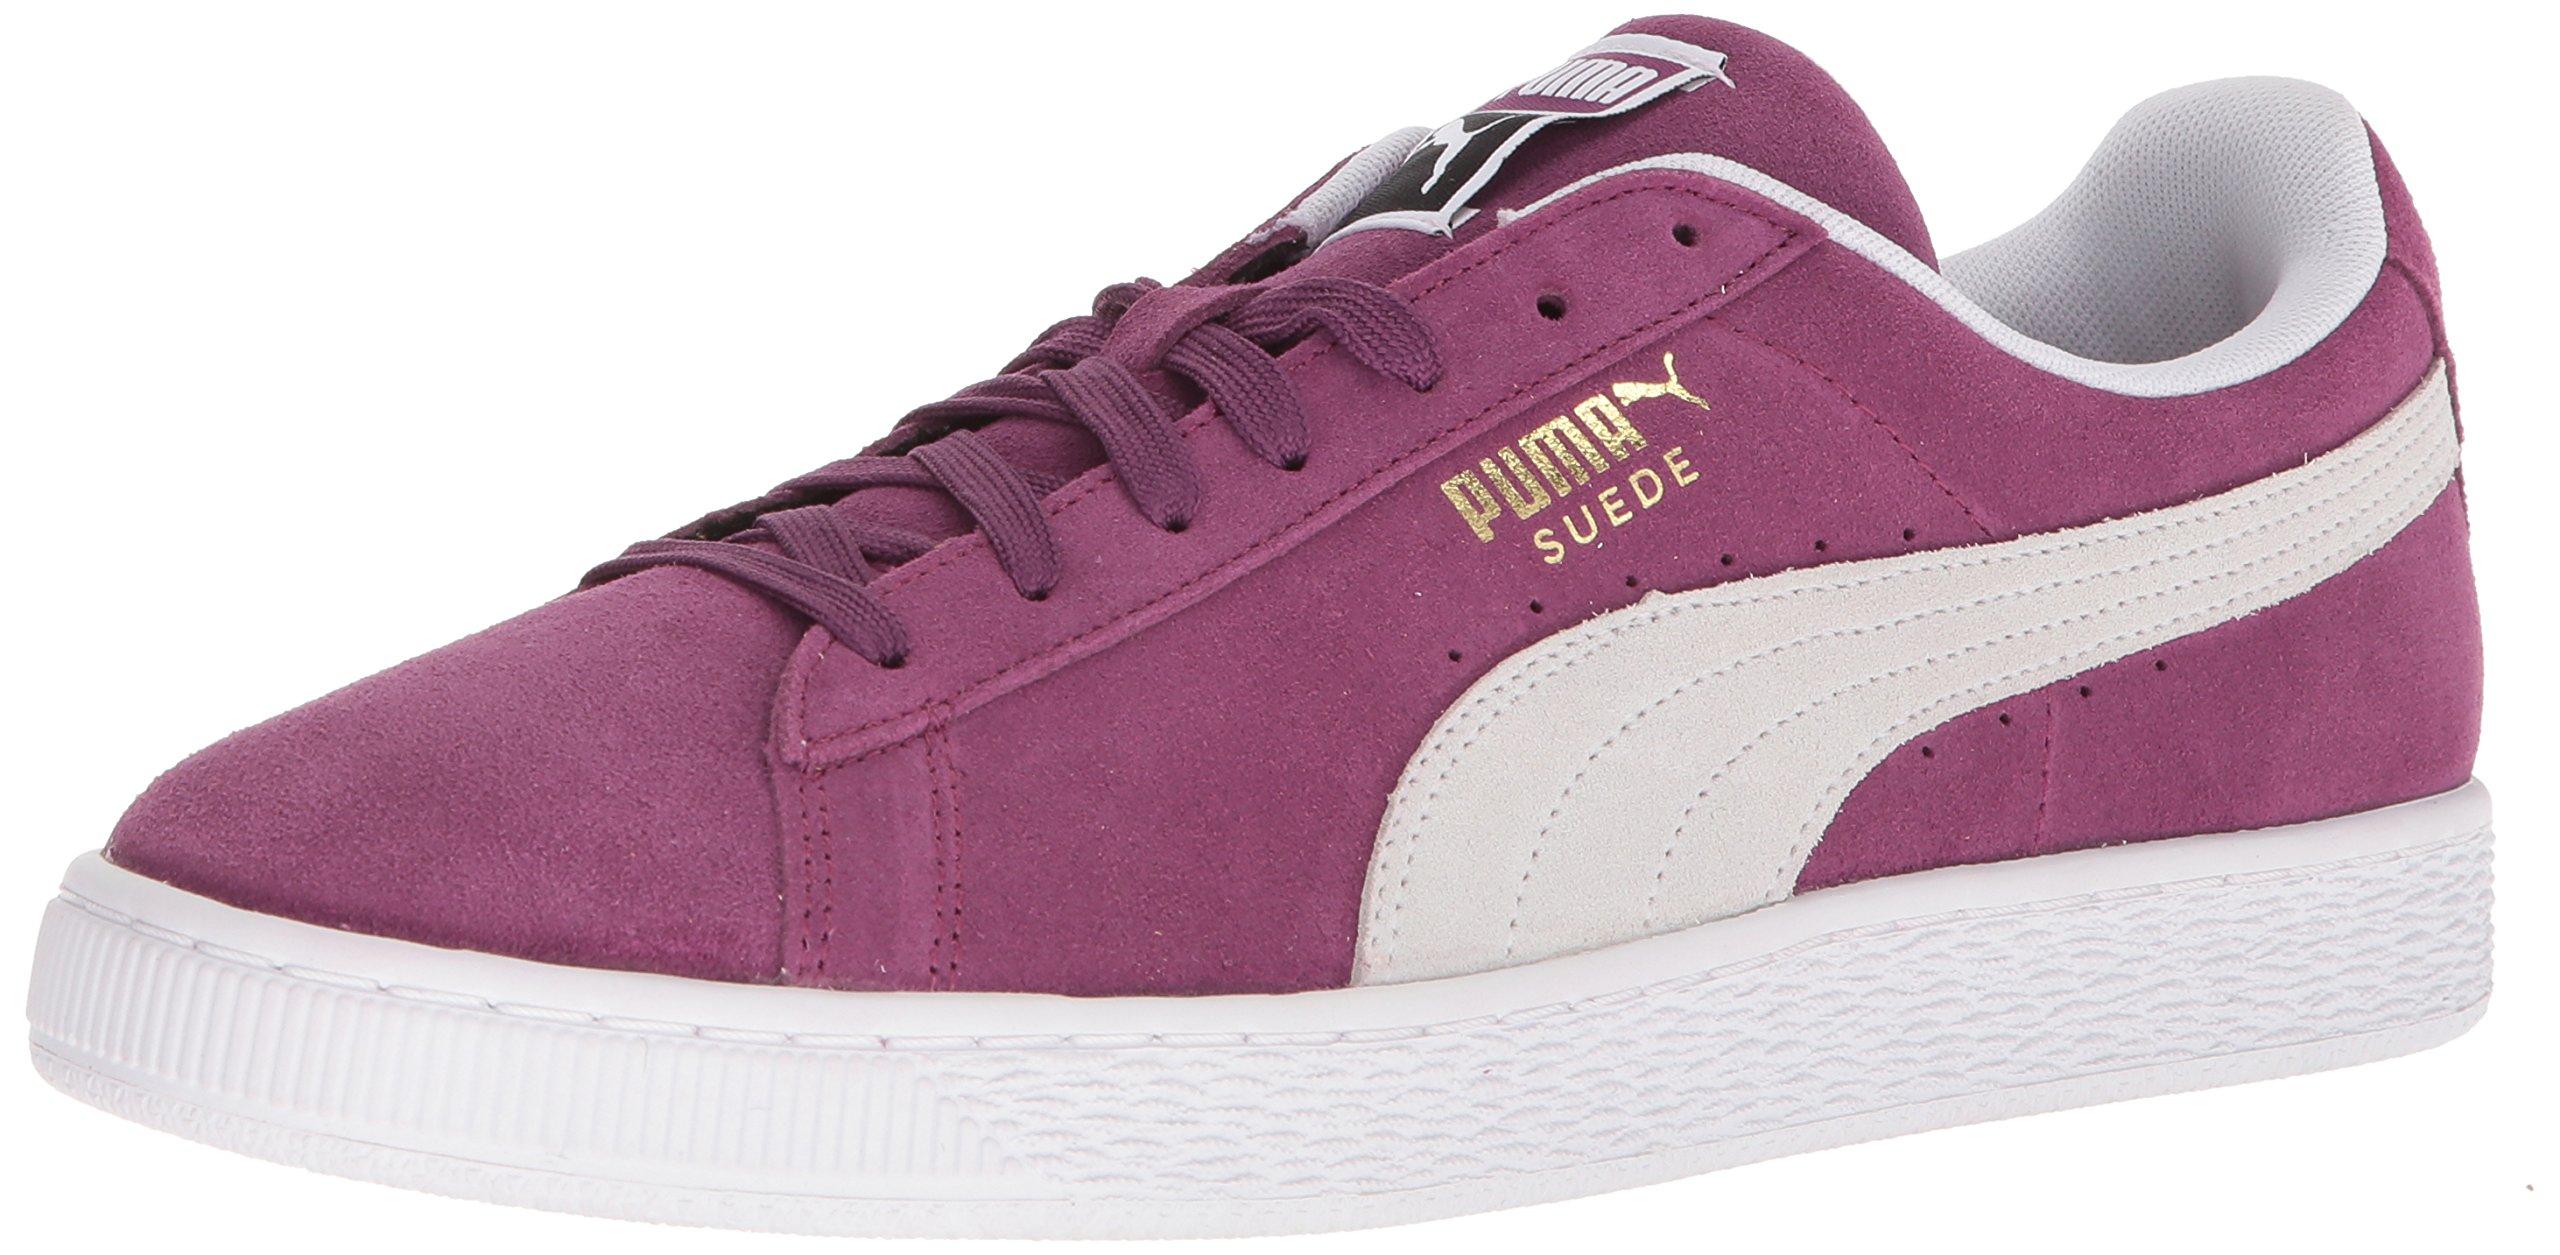 819b4262fdf4 Galleon - PUMA Suede Classic Sneaker